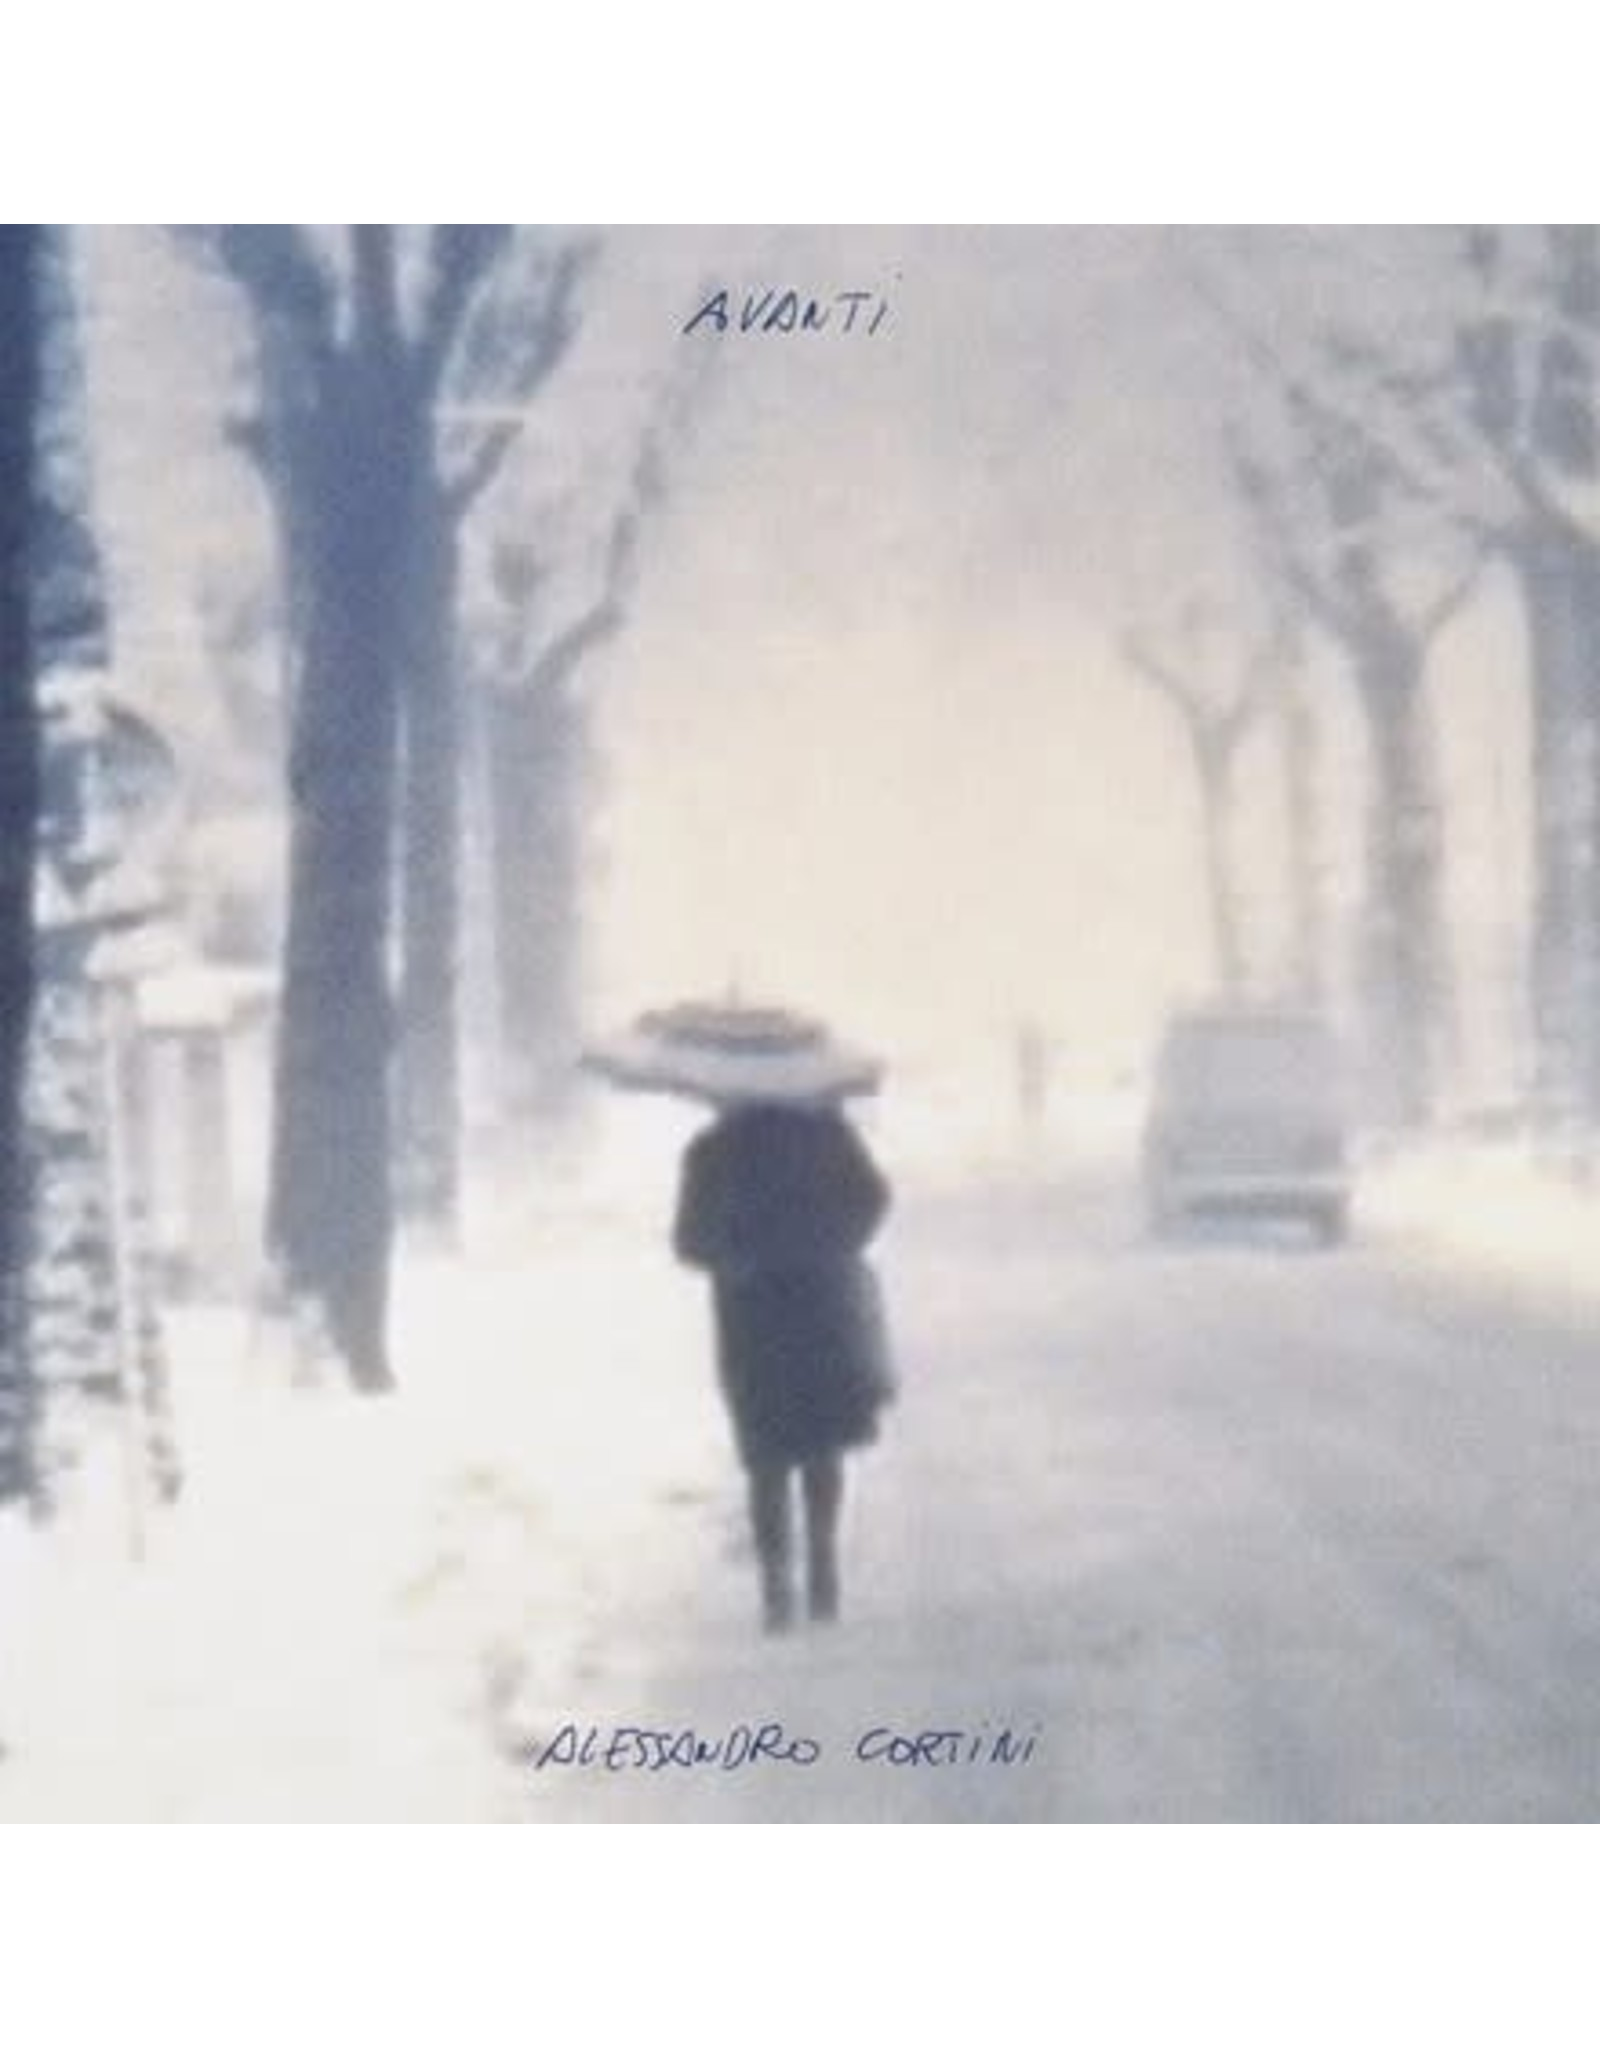 PIAS Cortini, Alessandro: Avanti LP